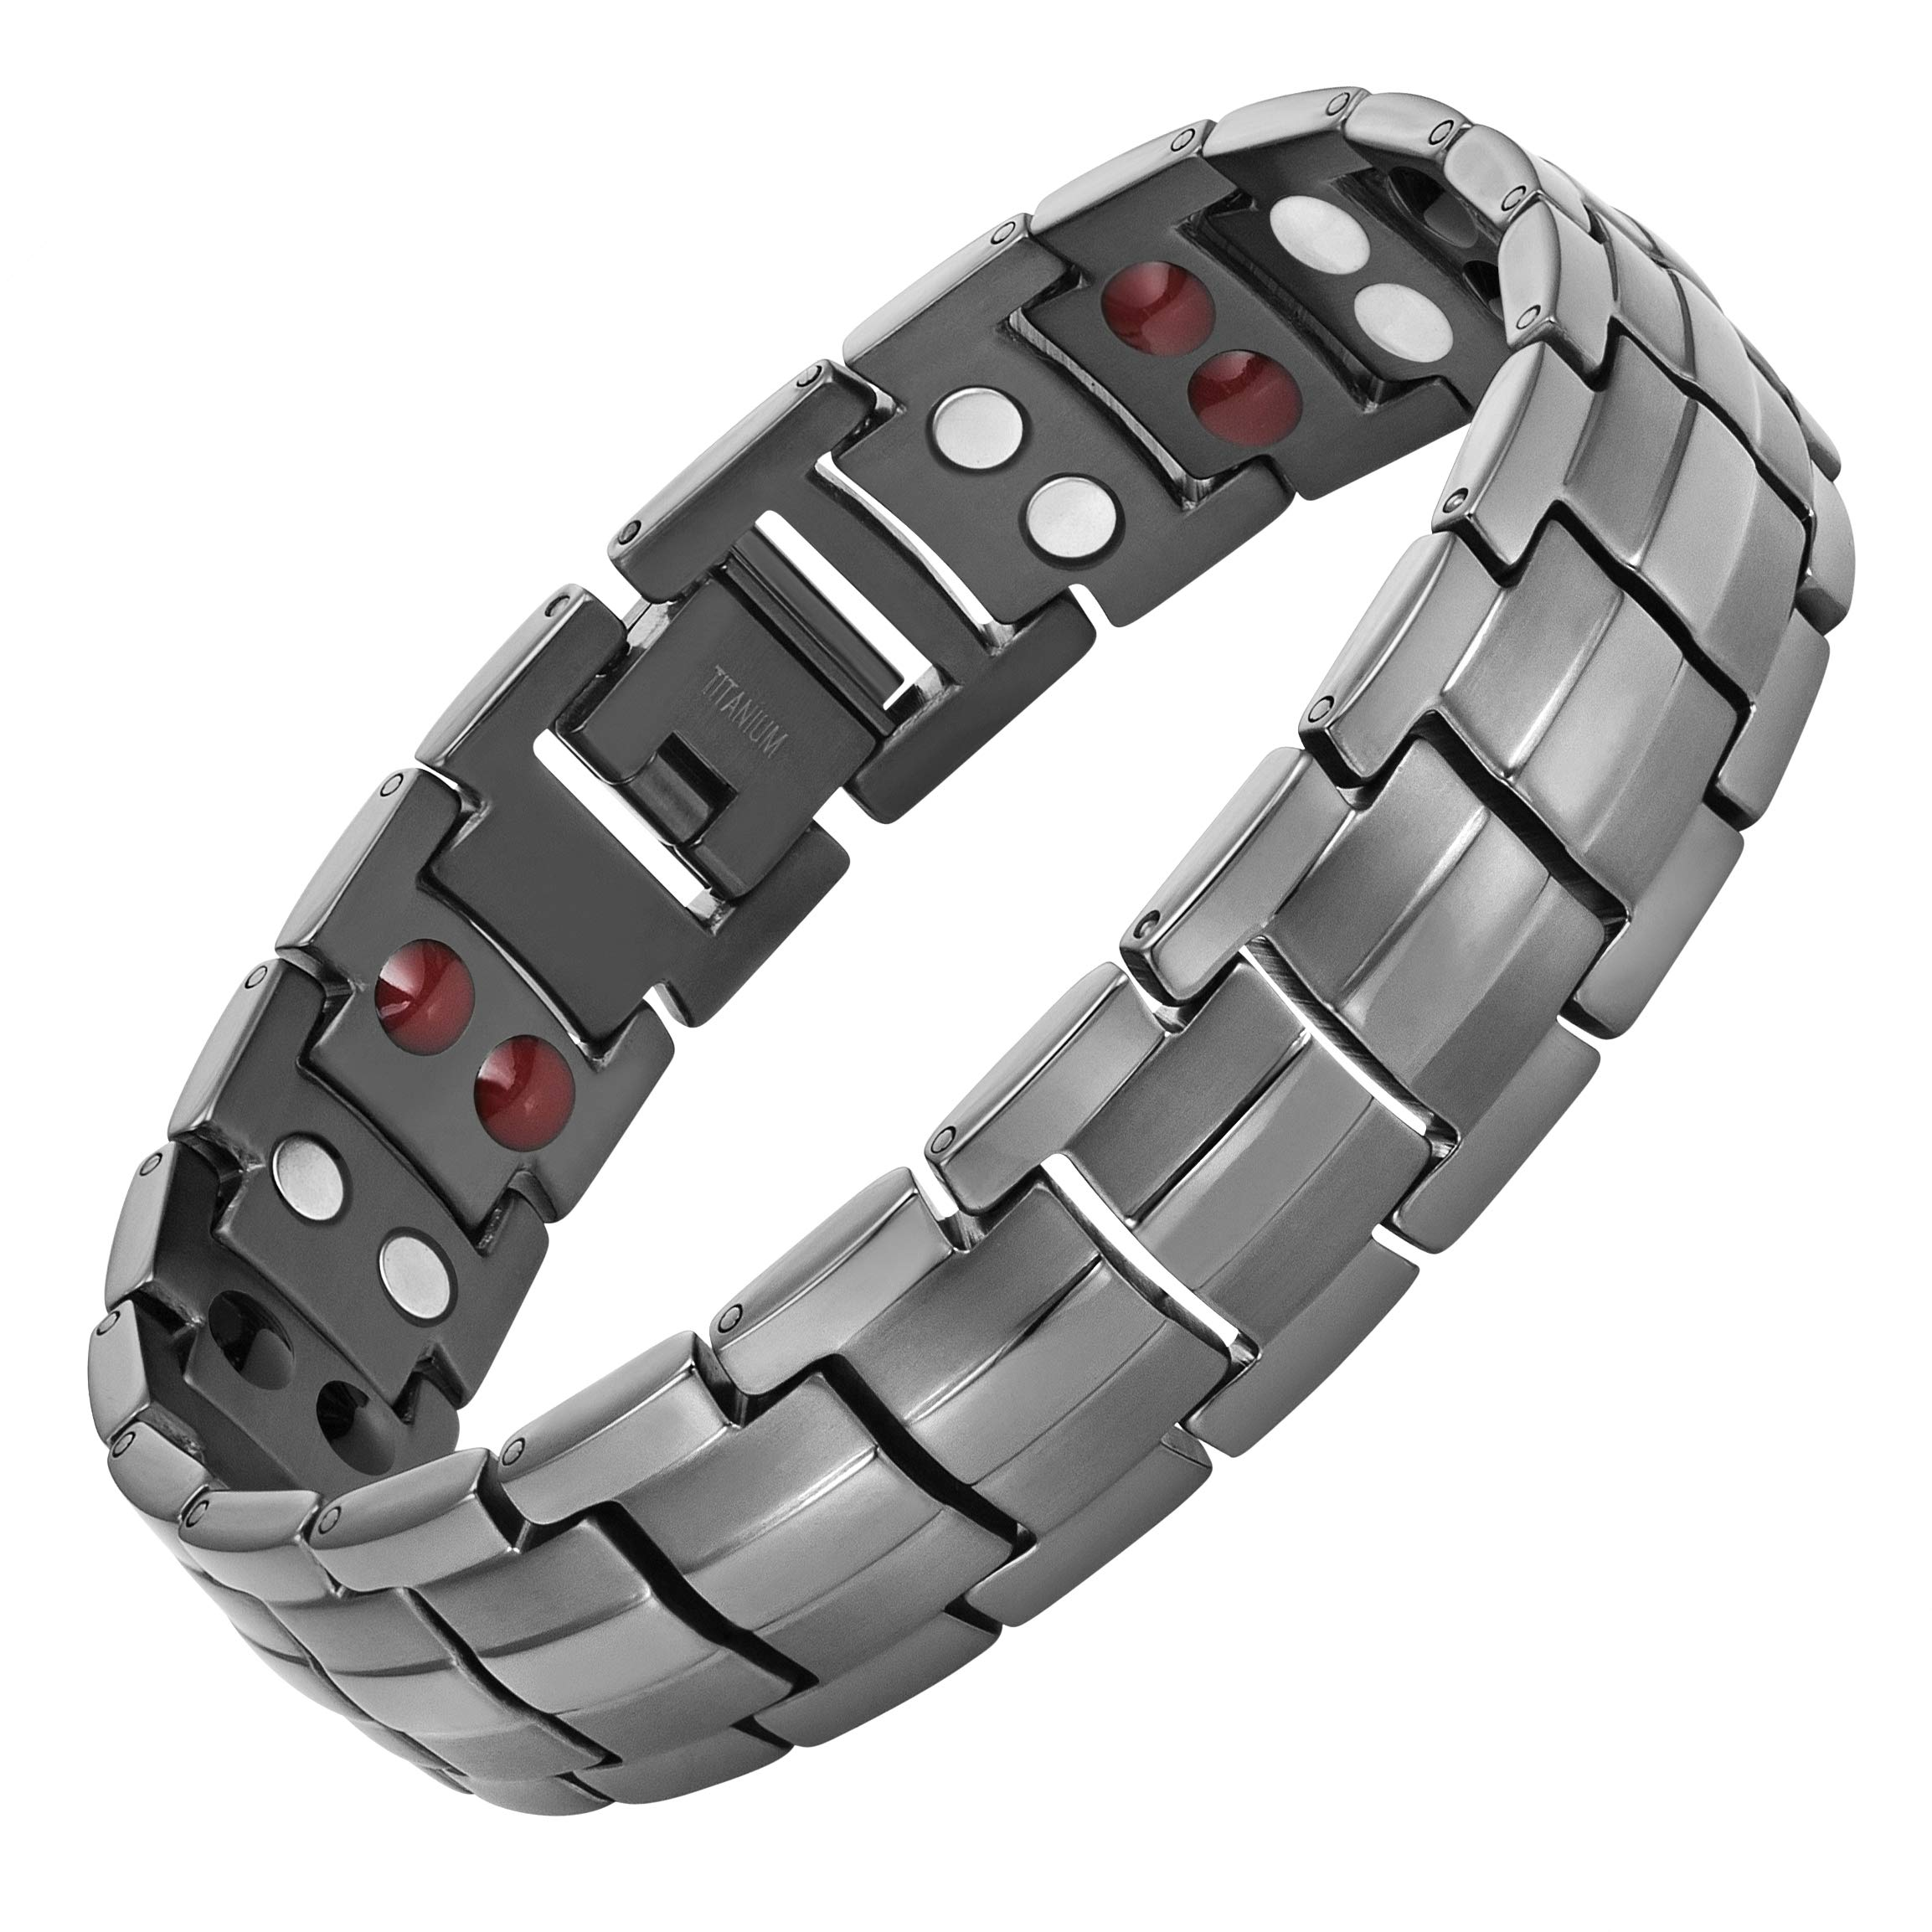 Willis Judd Double Strength 4 Element Titanium Magnetic Therapy Bracelet for Arthritis Pain Relief Gunmetal Colour Adjustable